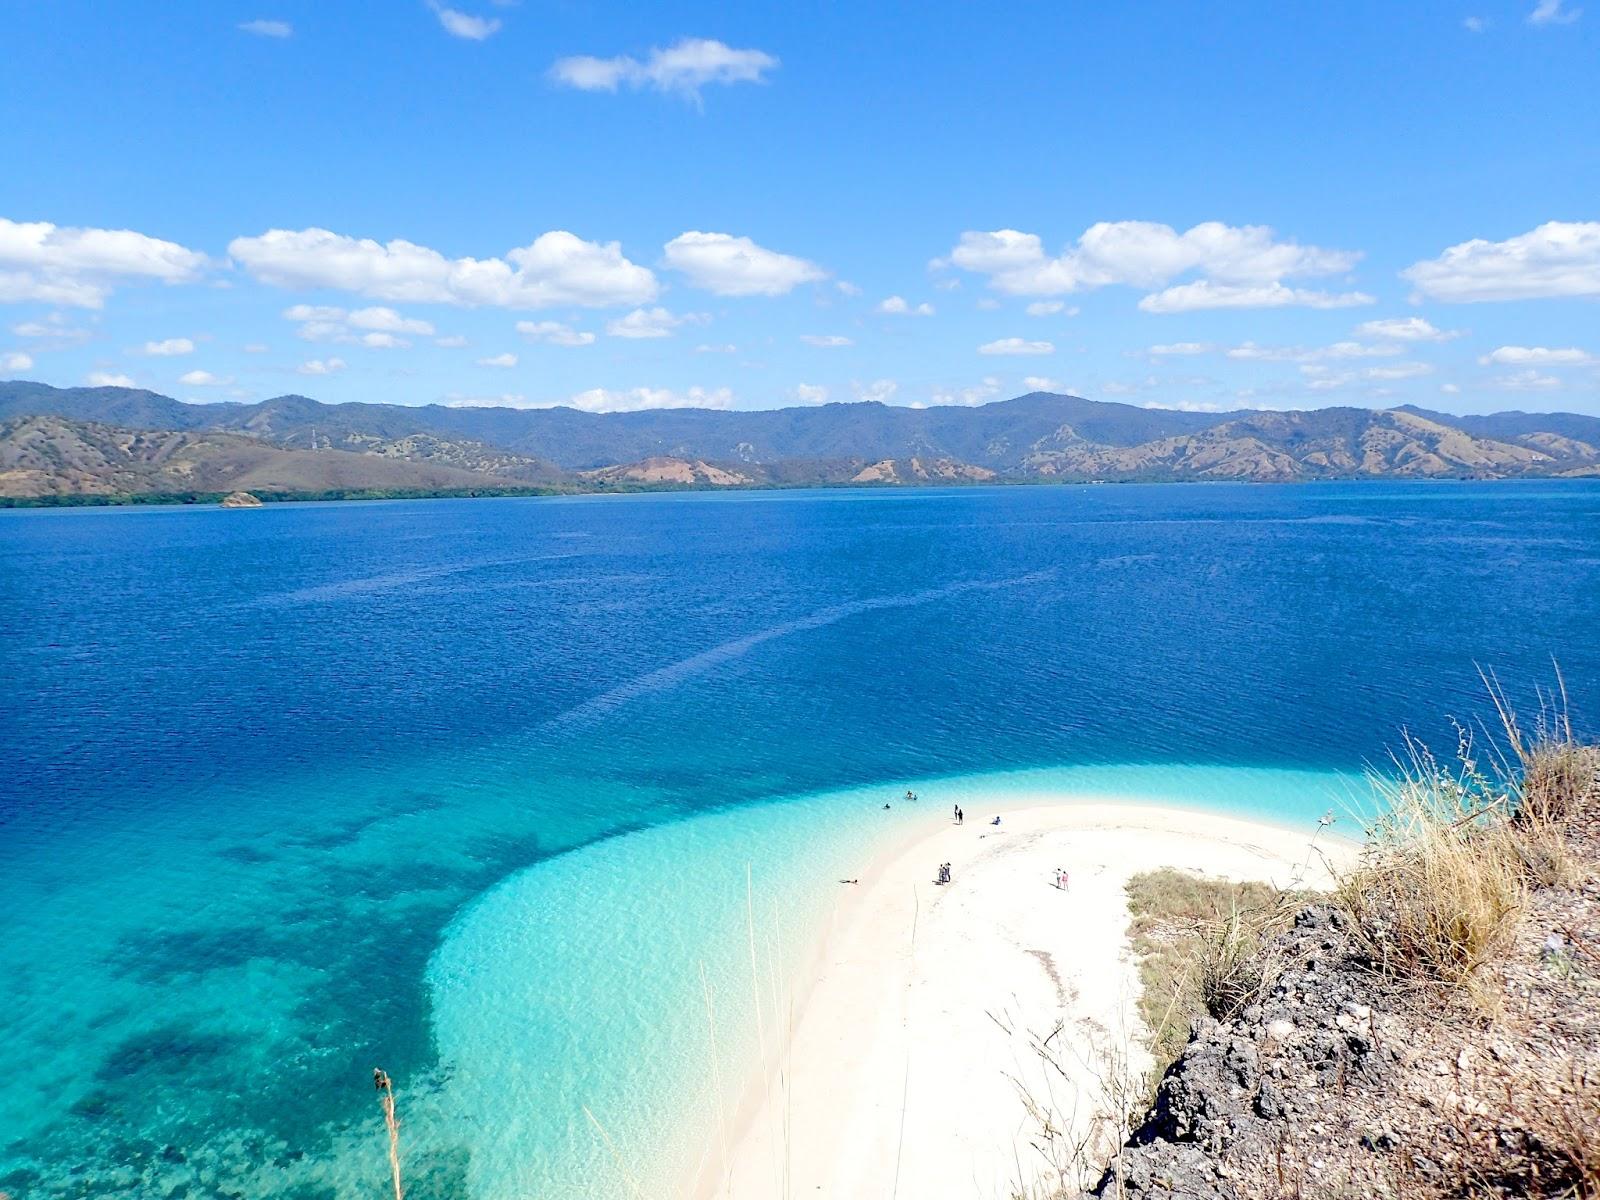 17 Island Marine Park, Three Color Lake, Pink Beach and Komod National Park 10 Days